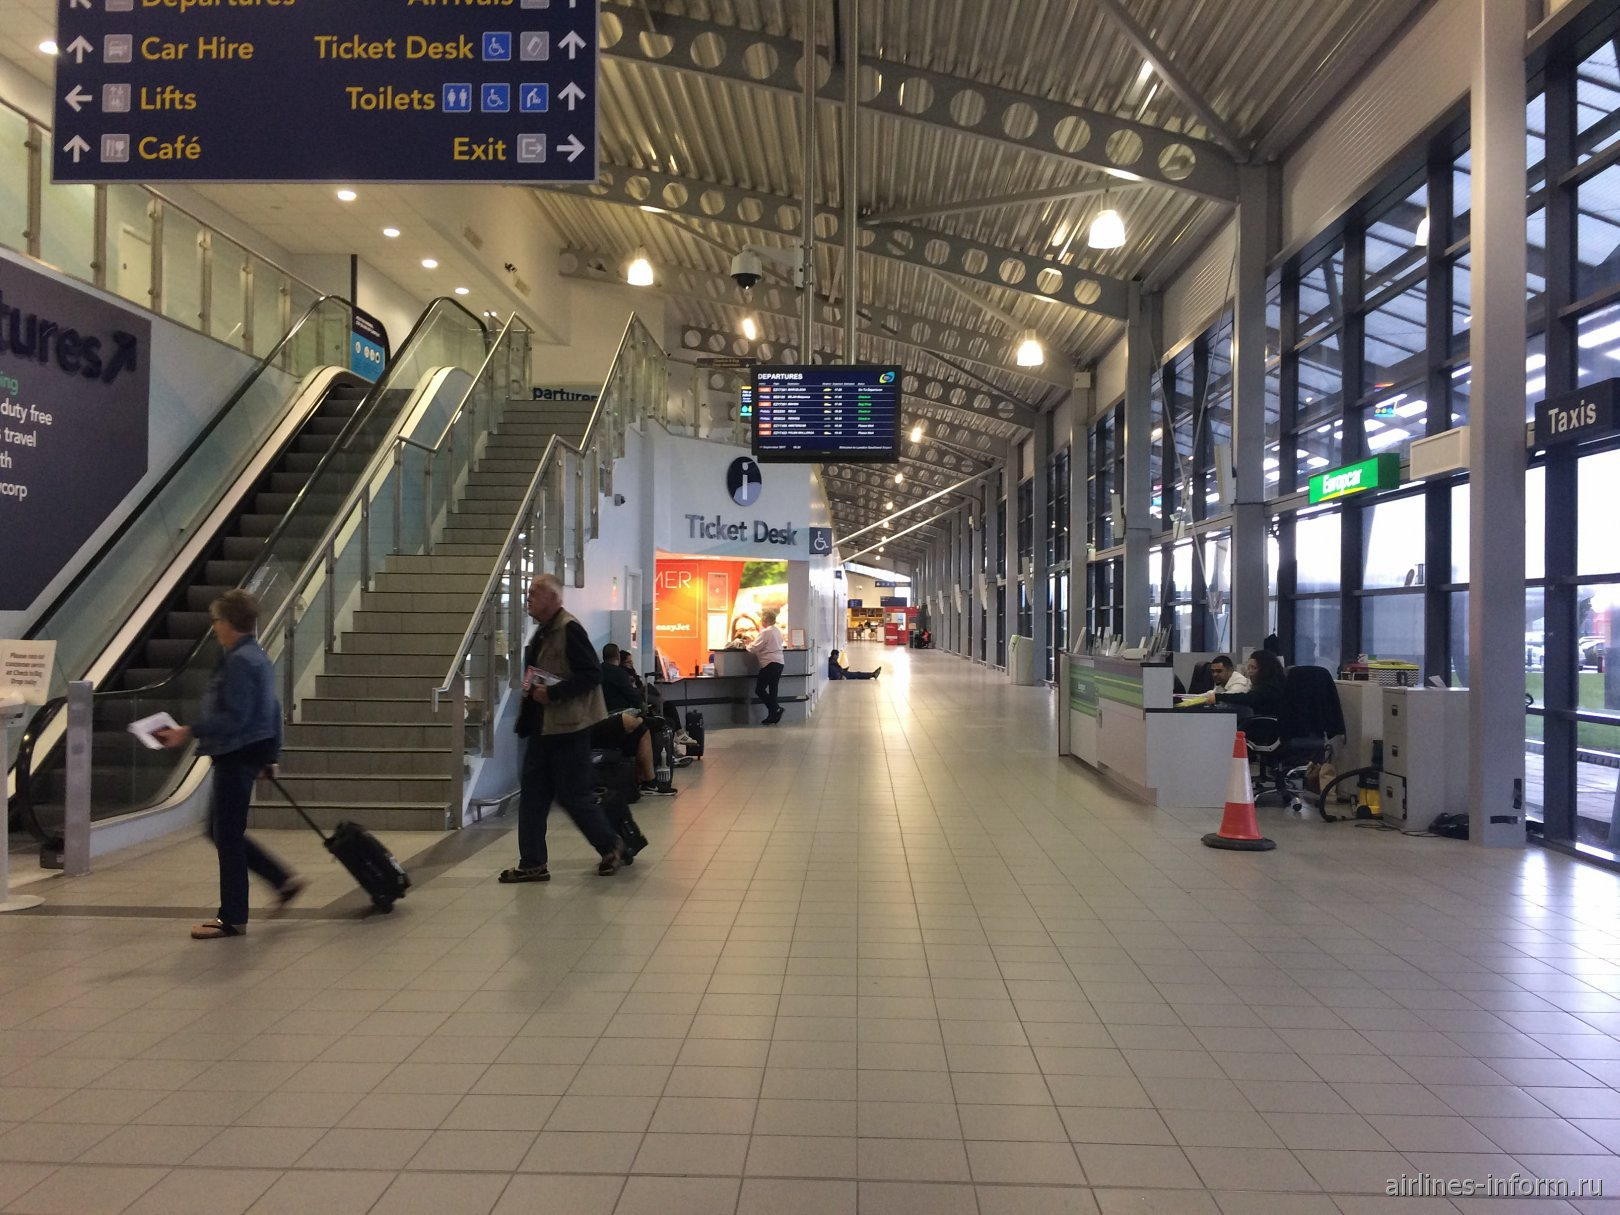 Внутри пассажирского терминала аэропорта Лондон Саутенд